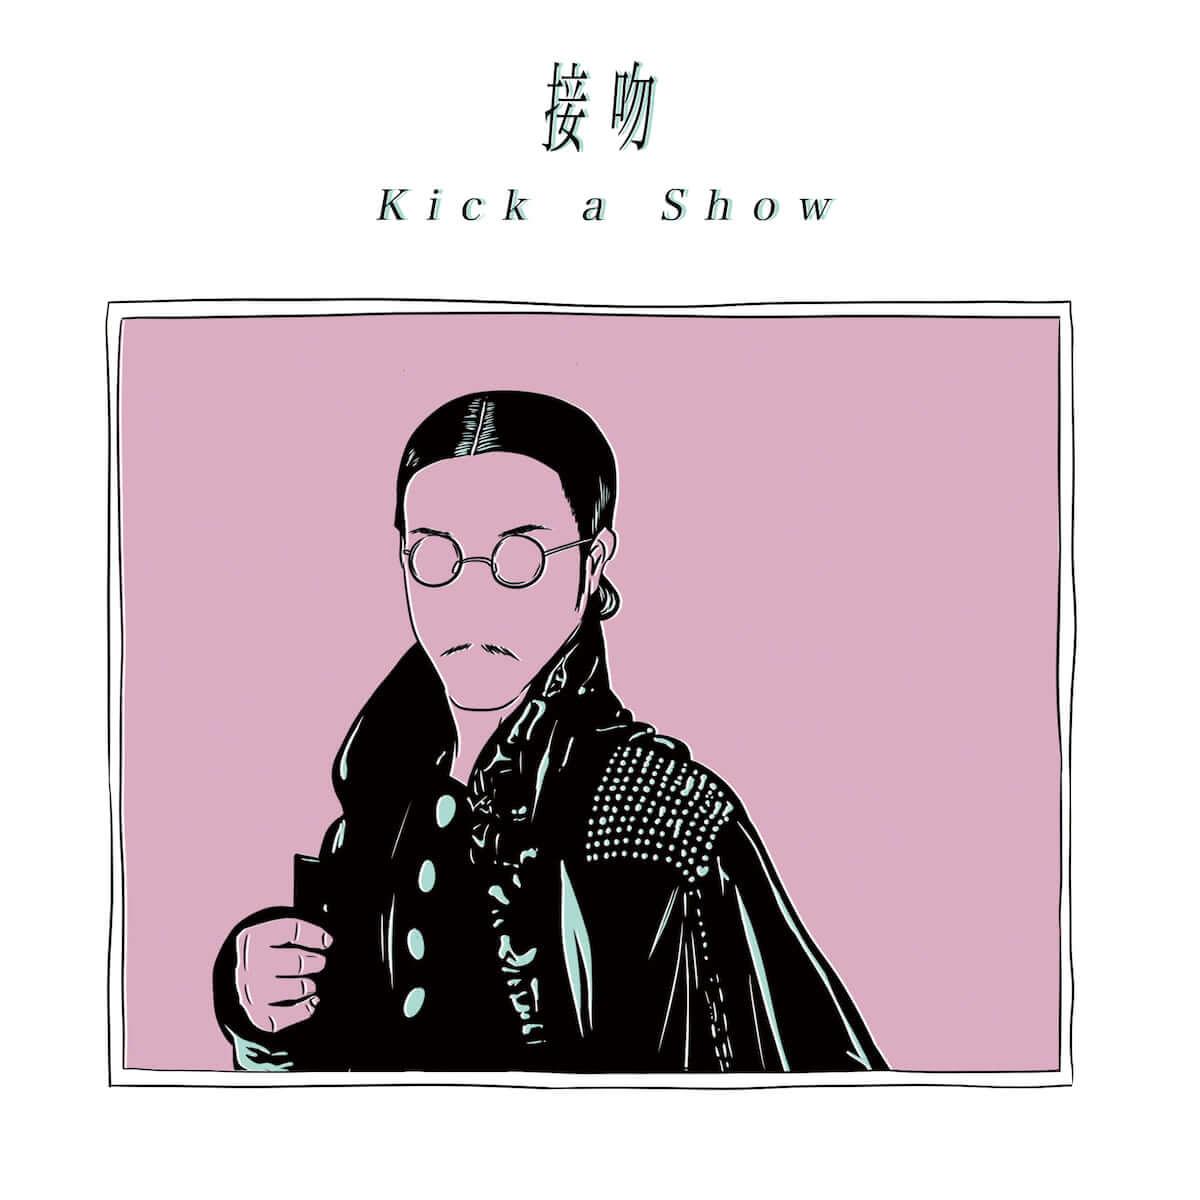 LOVEが溢れる!Kick a ShowがORIGINAL LOVE「接吻」のカバーをバレンタインデーにリリース music190208-kickashow-1200x1200